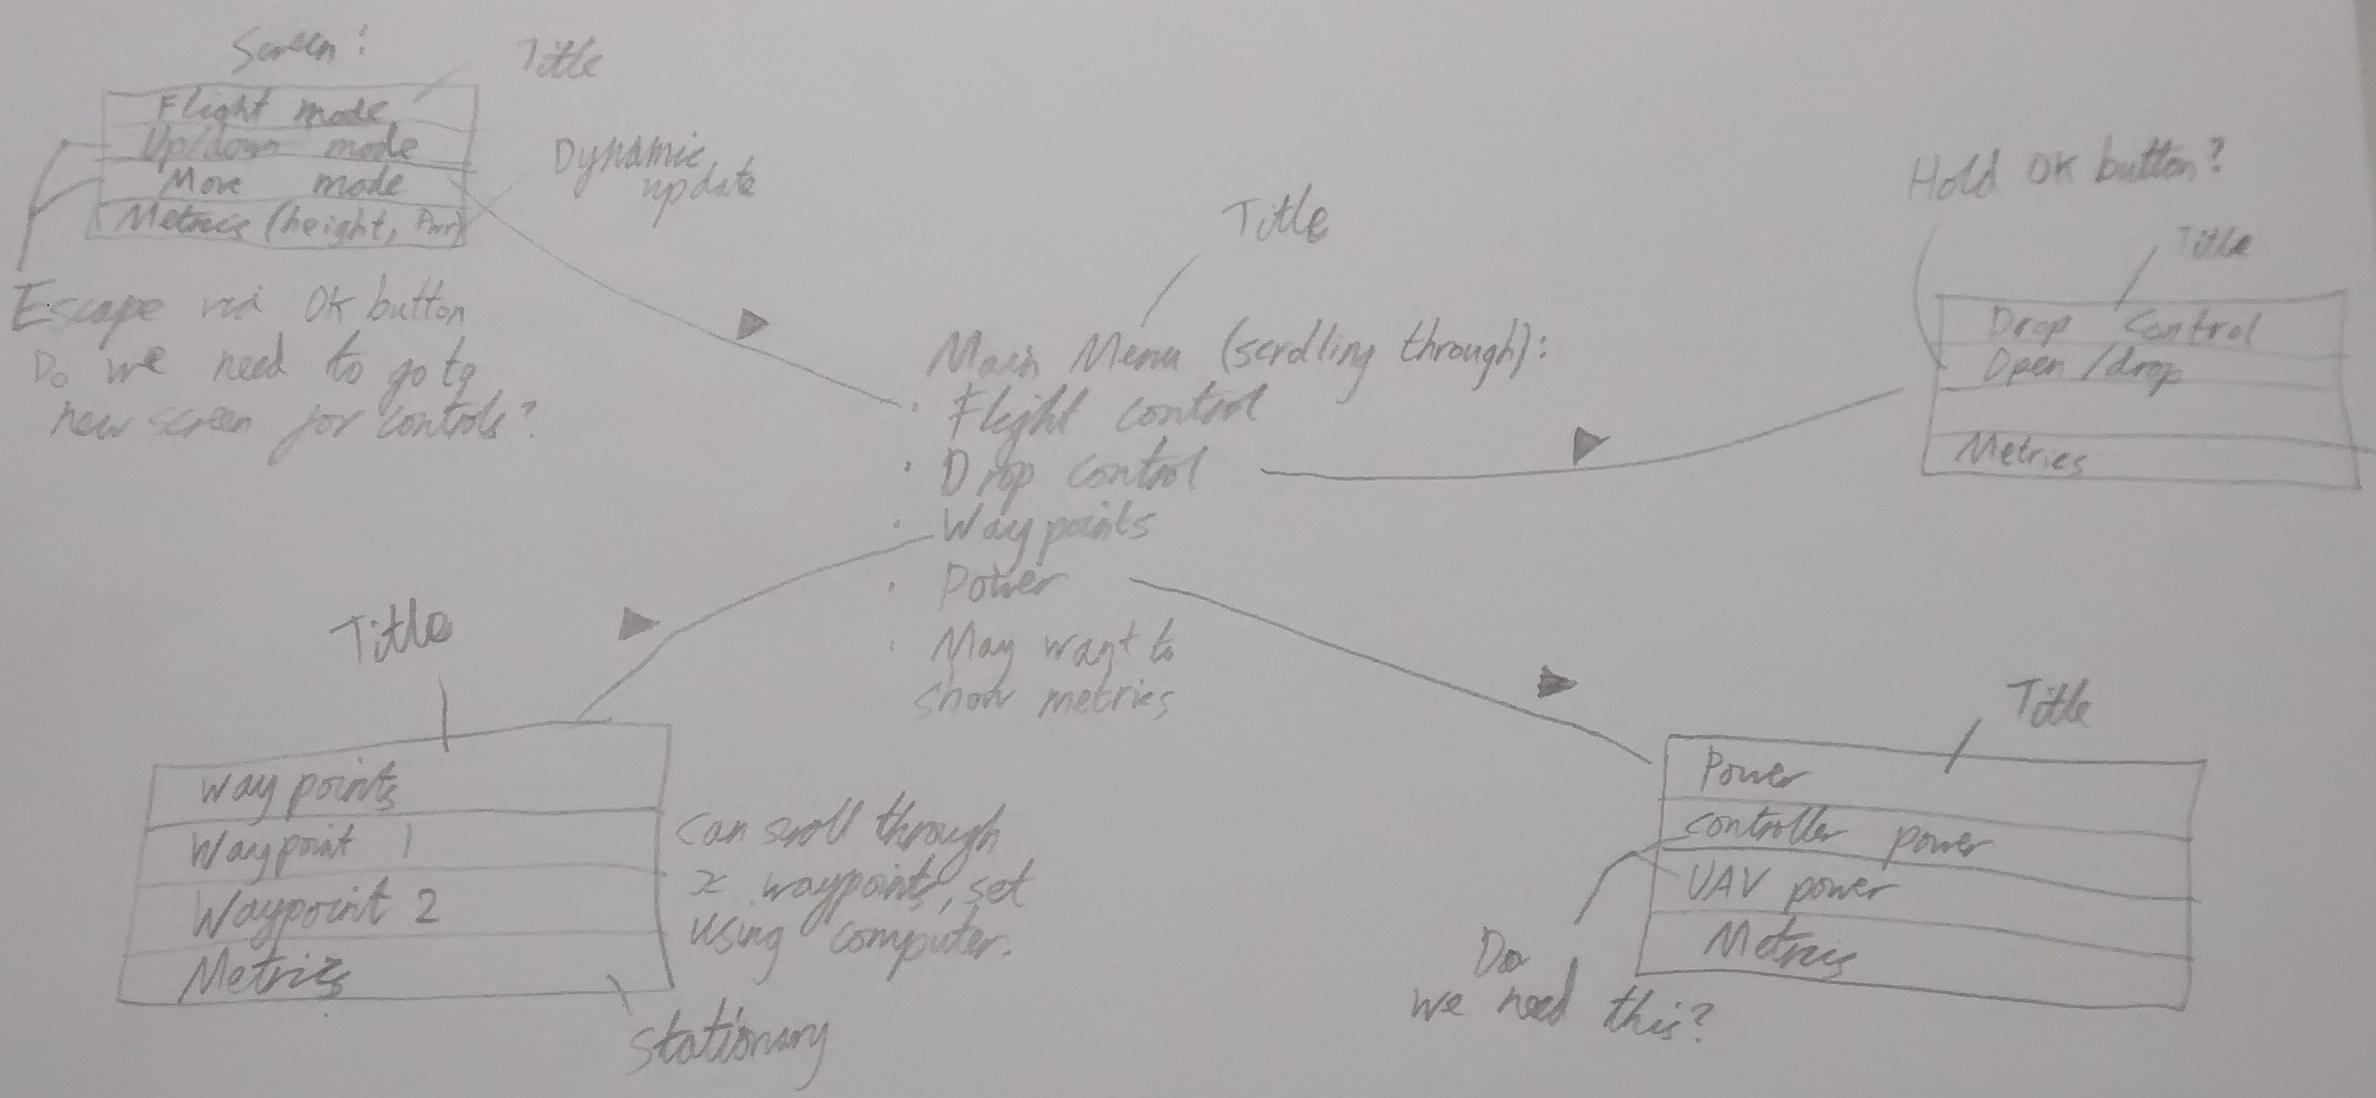 controller flow diagram